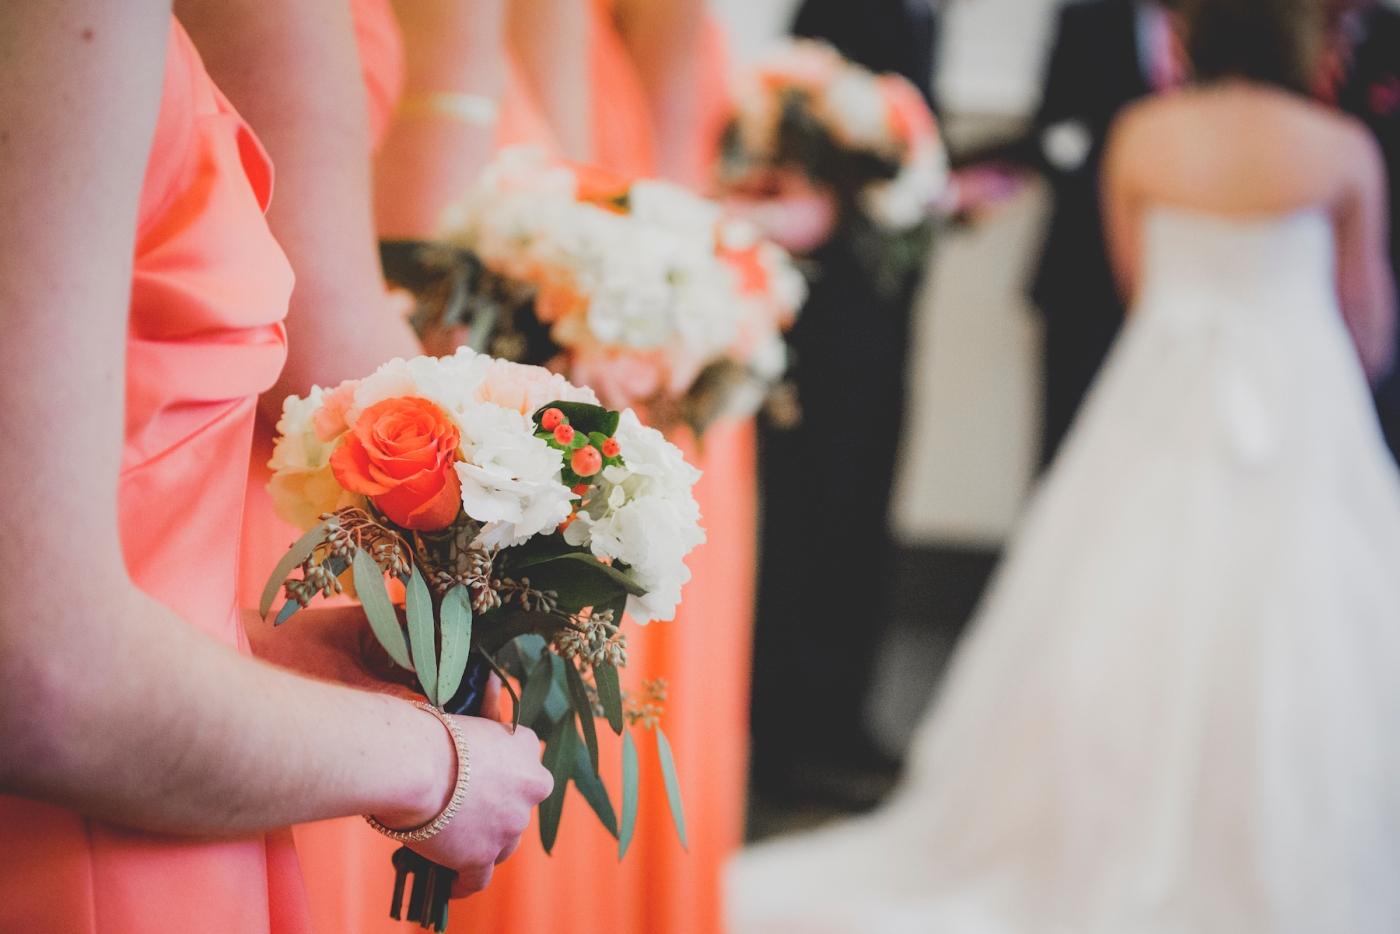 DSC_2587Everett_Wedding_Ballroom_Jane_Speleers_photography_Rachel_and_Edmund_Ceremony_2017